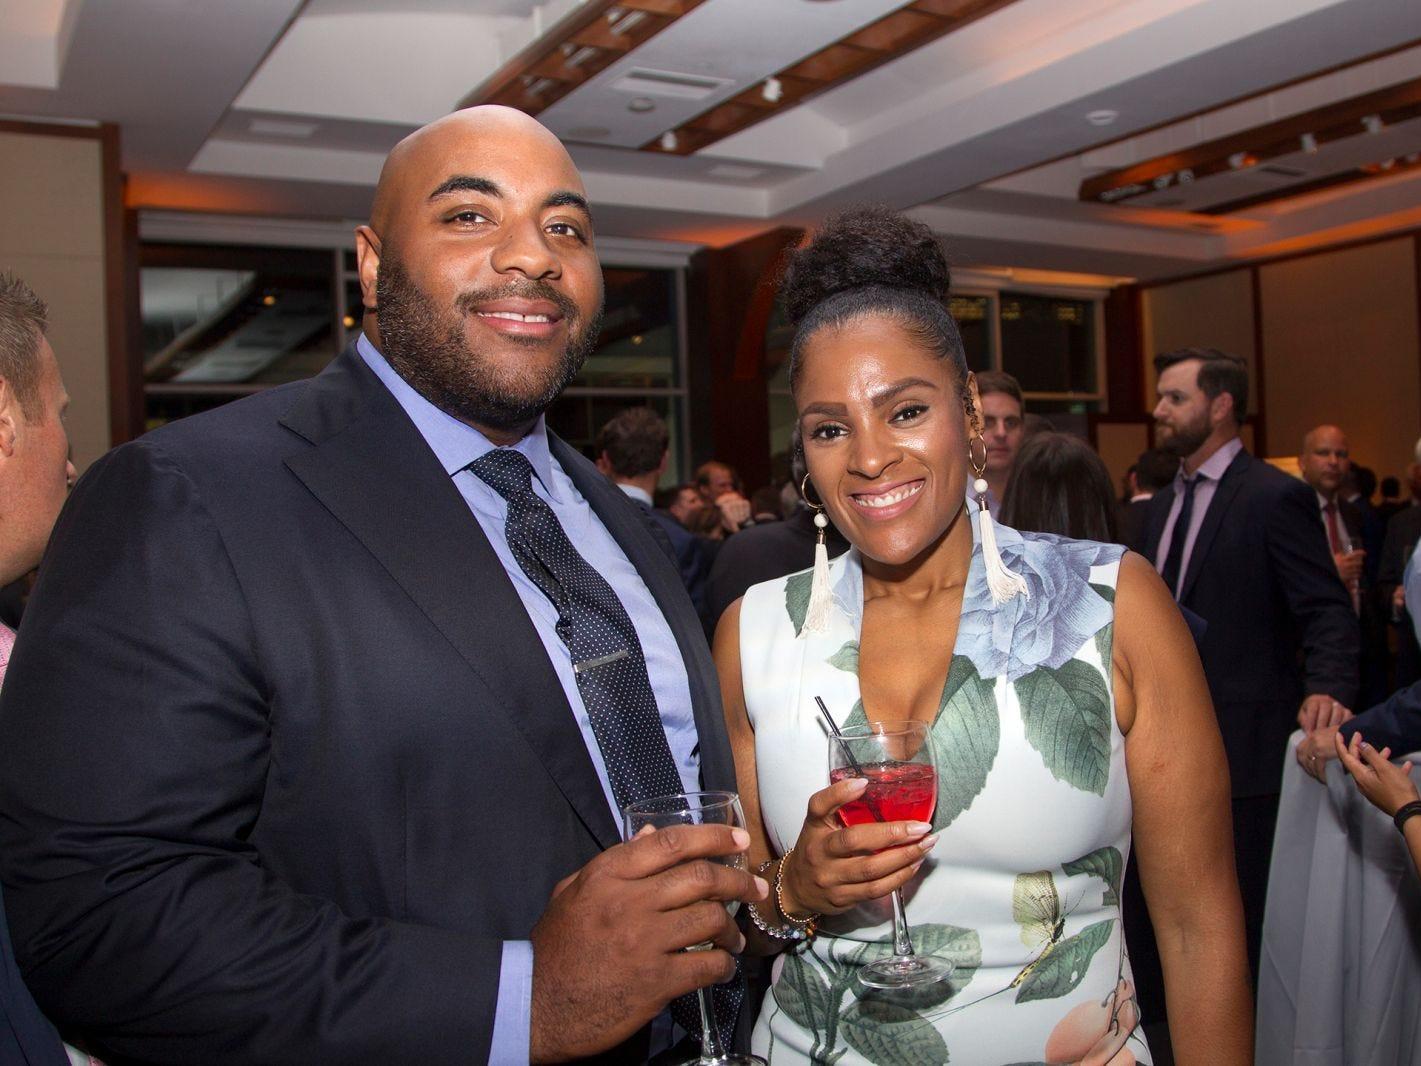 Stephanie LaRosiliera and Julius Williams. 11th annual IronMatt Fundraiser Gala at Pier 60 Chelsea Piers. 09/20/2018